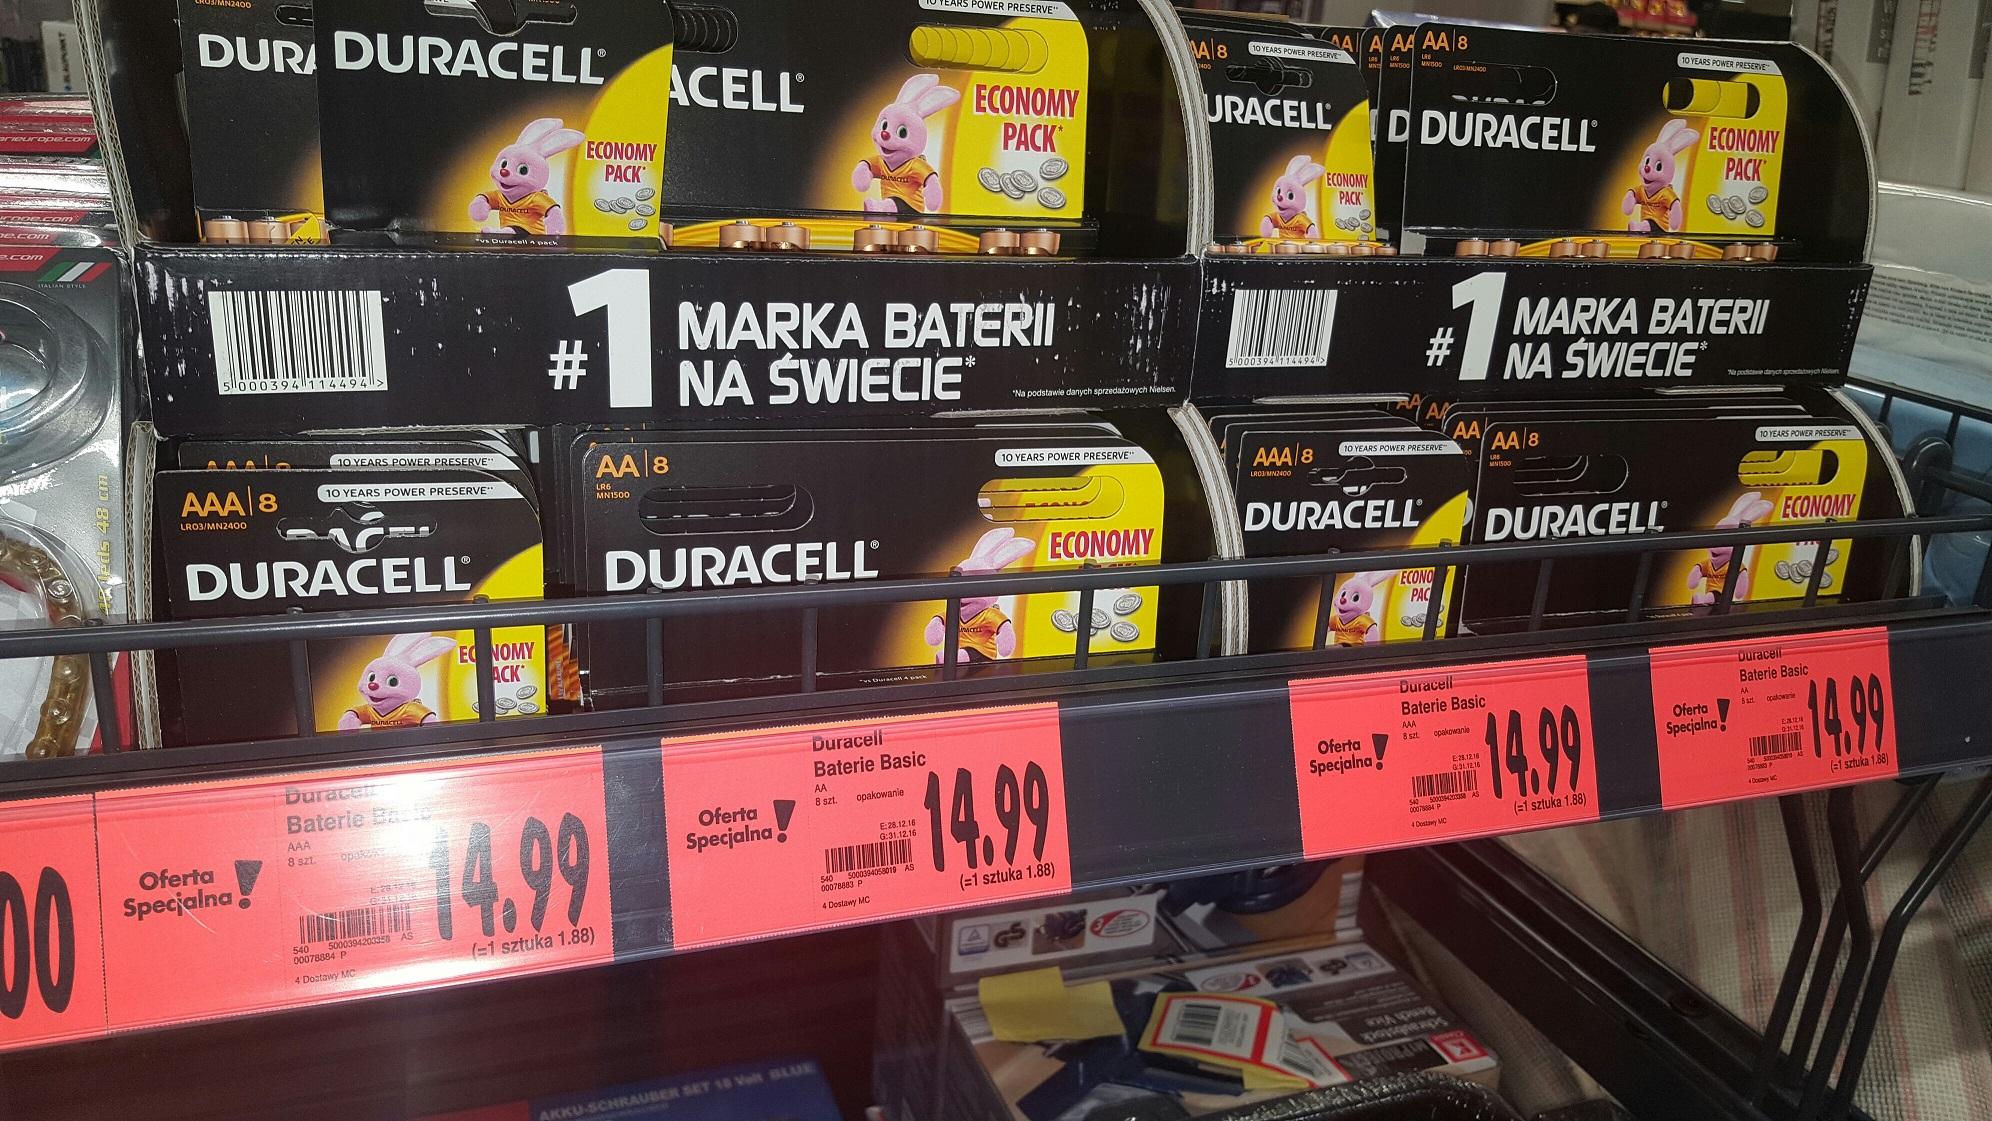 DURACELL Baterie alkaliczne (8szt.) - AA i AAA - KAUFLAND